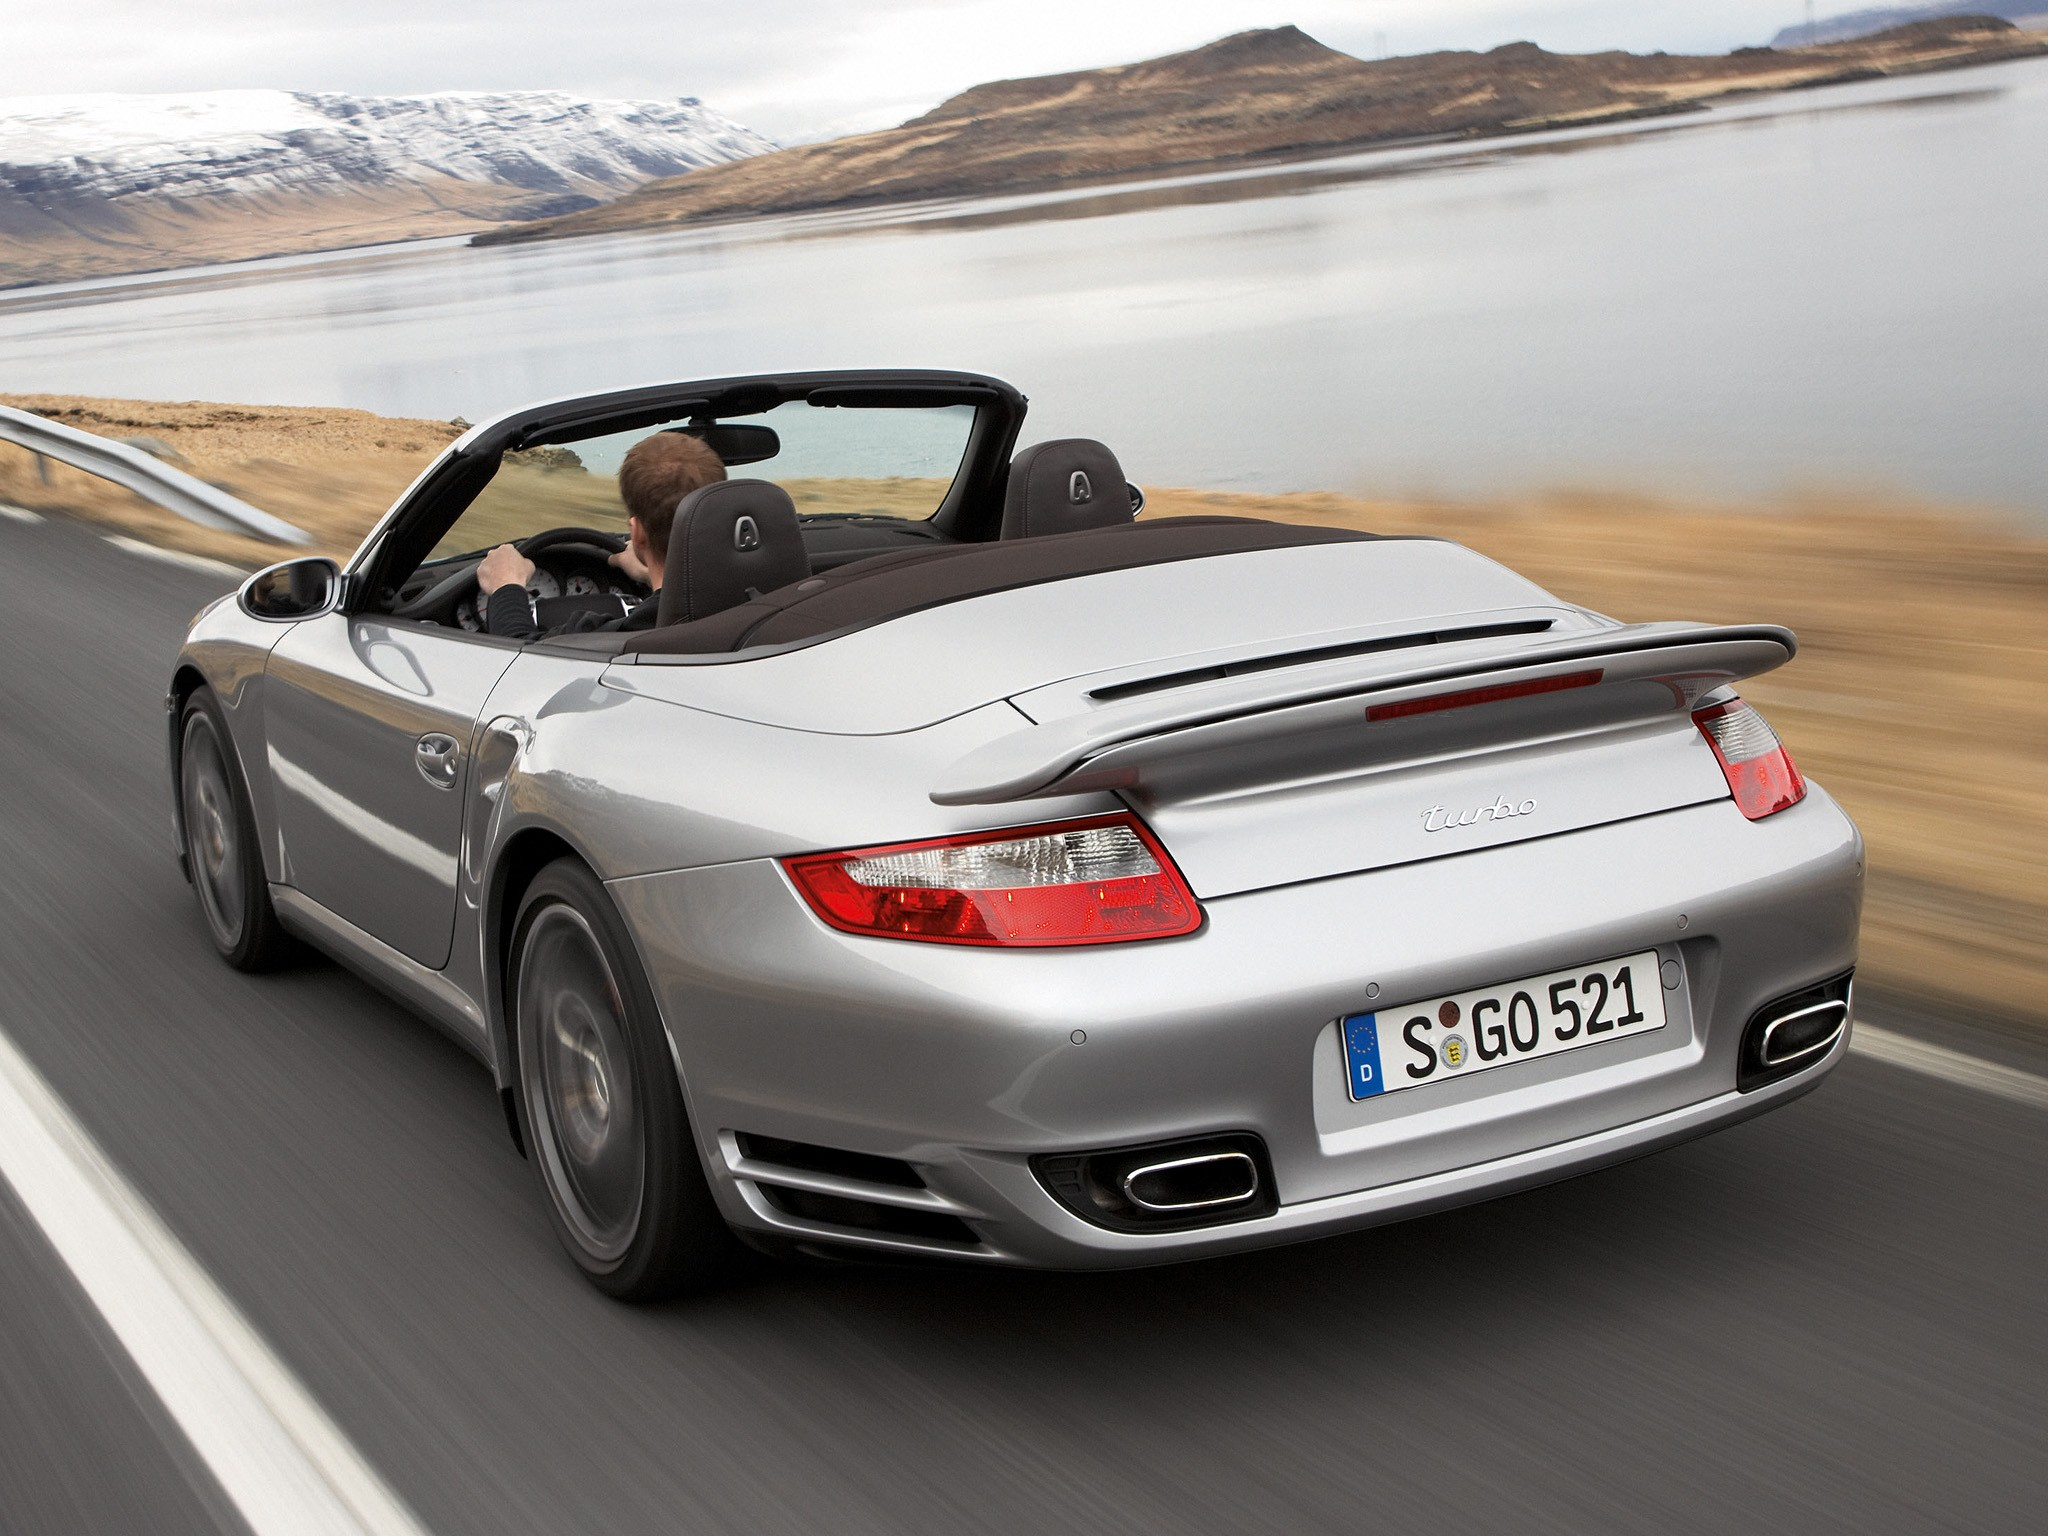 porsche 911 turbo cabriolet 997 specs 2007 2008 2009. Black Bedroom Furniture Sets. Home Design Ideas